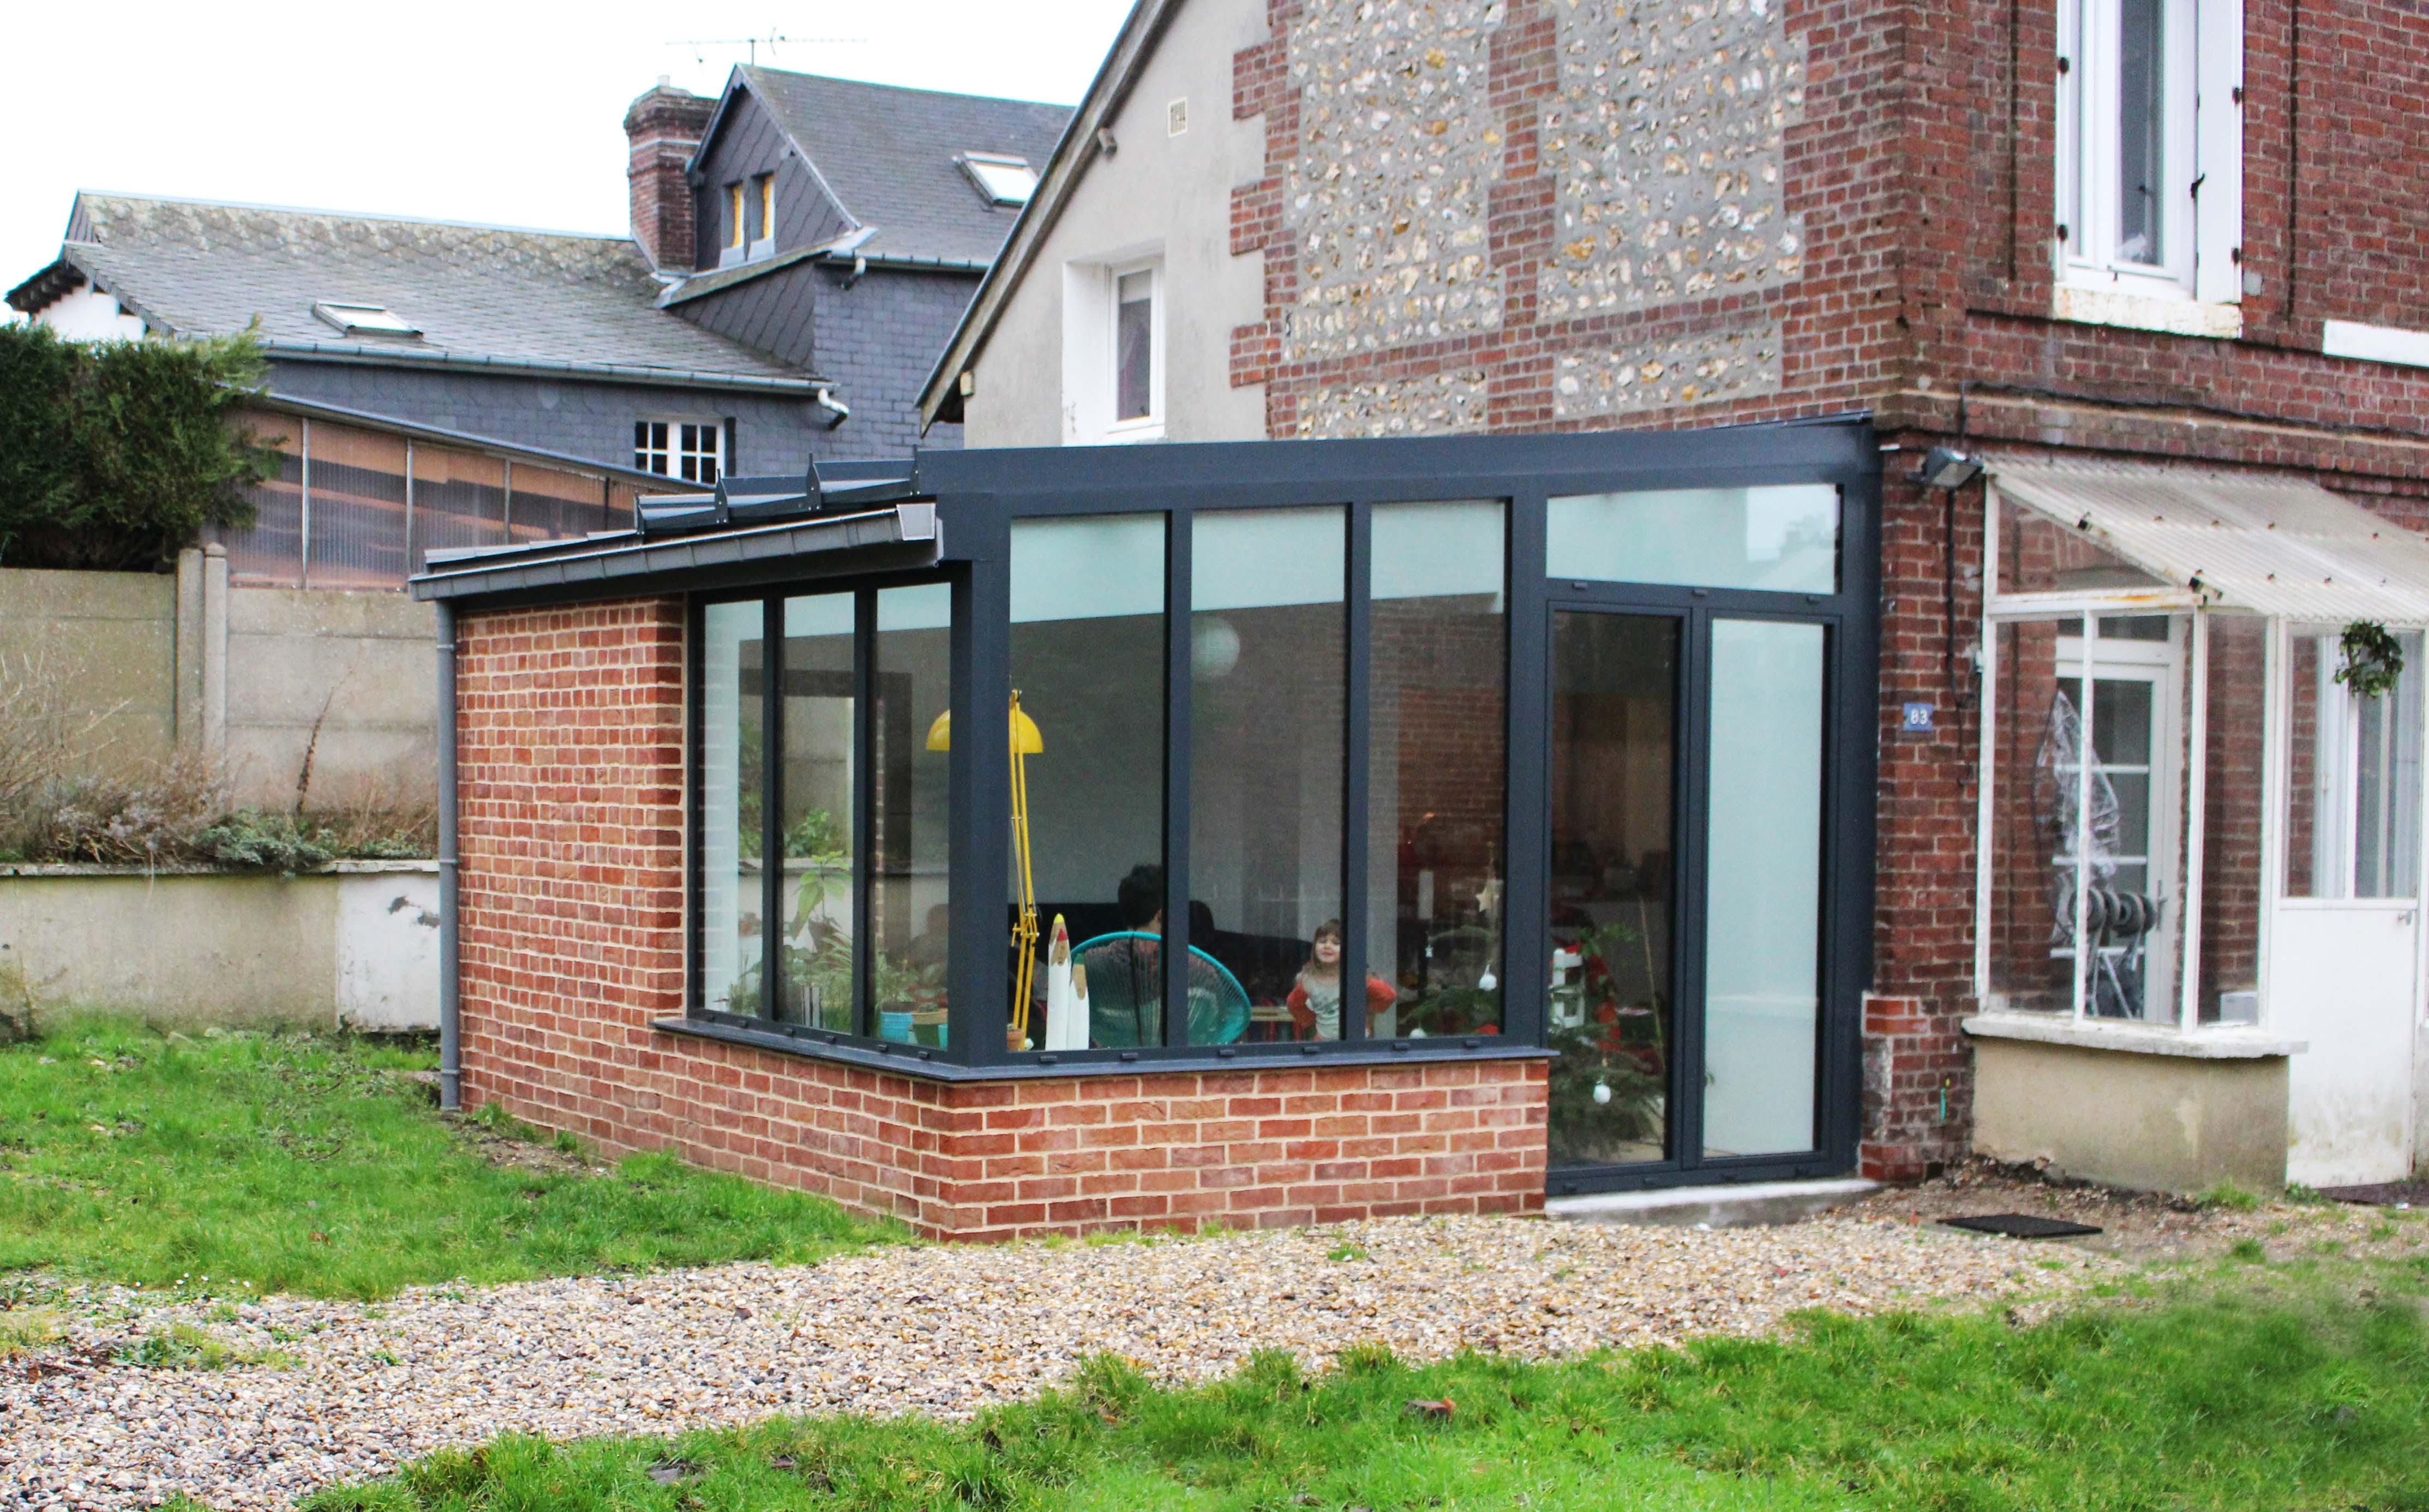 extension en verre finest toiture verre veranda lgant vranda extension avec coulissant d angle. Black Bedroom Furniture Sets. Home Design Ideas